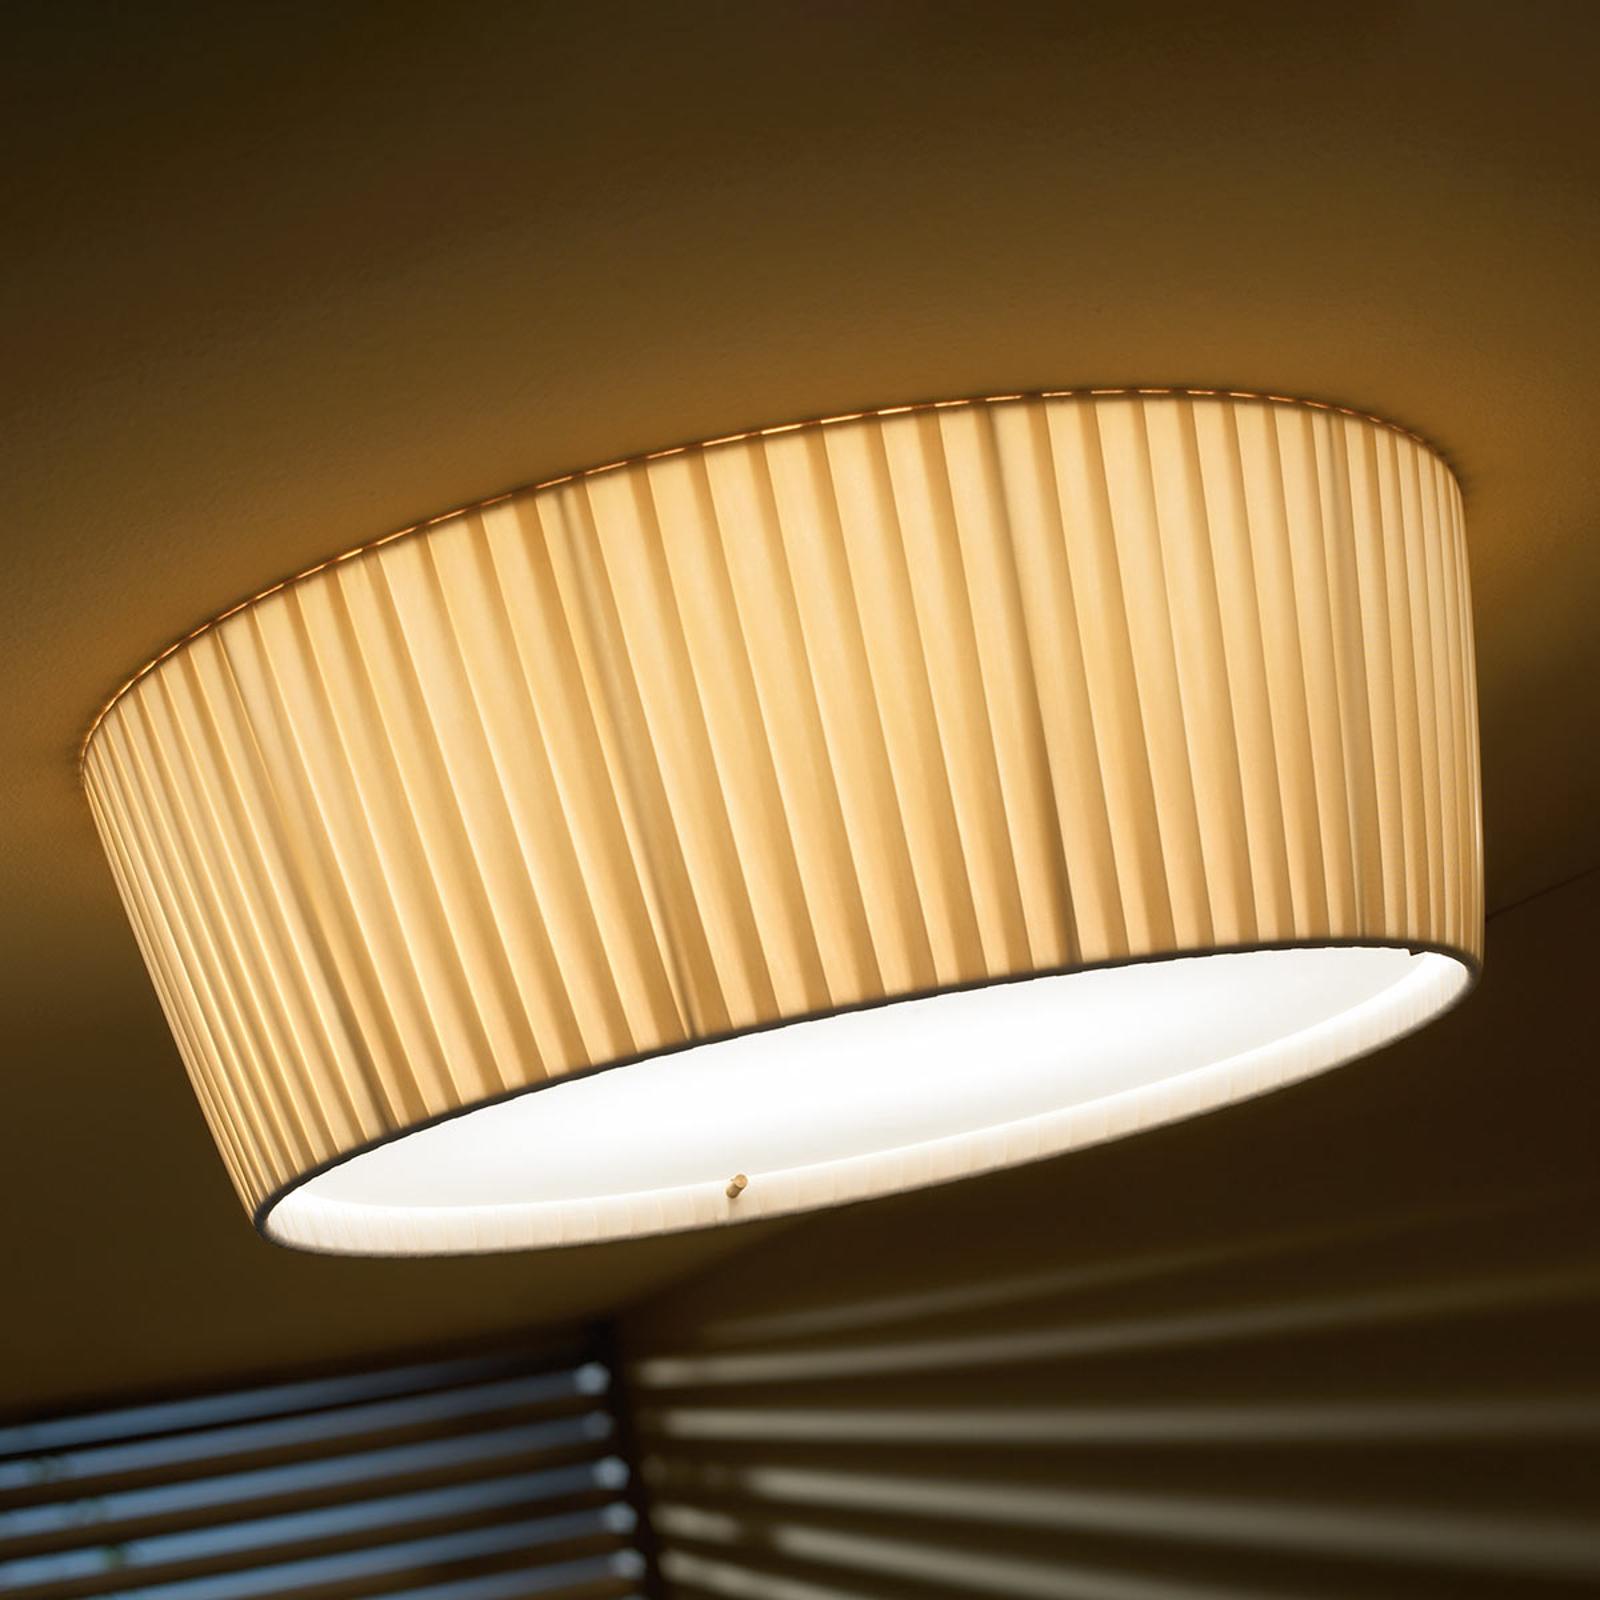 Bover Plafonet 43 stoffen plafondlamp, Band crème